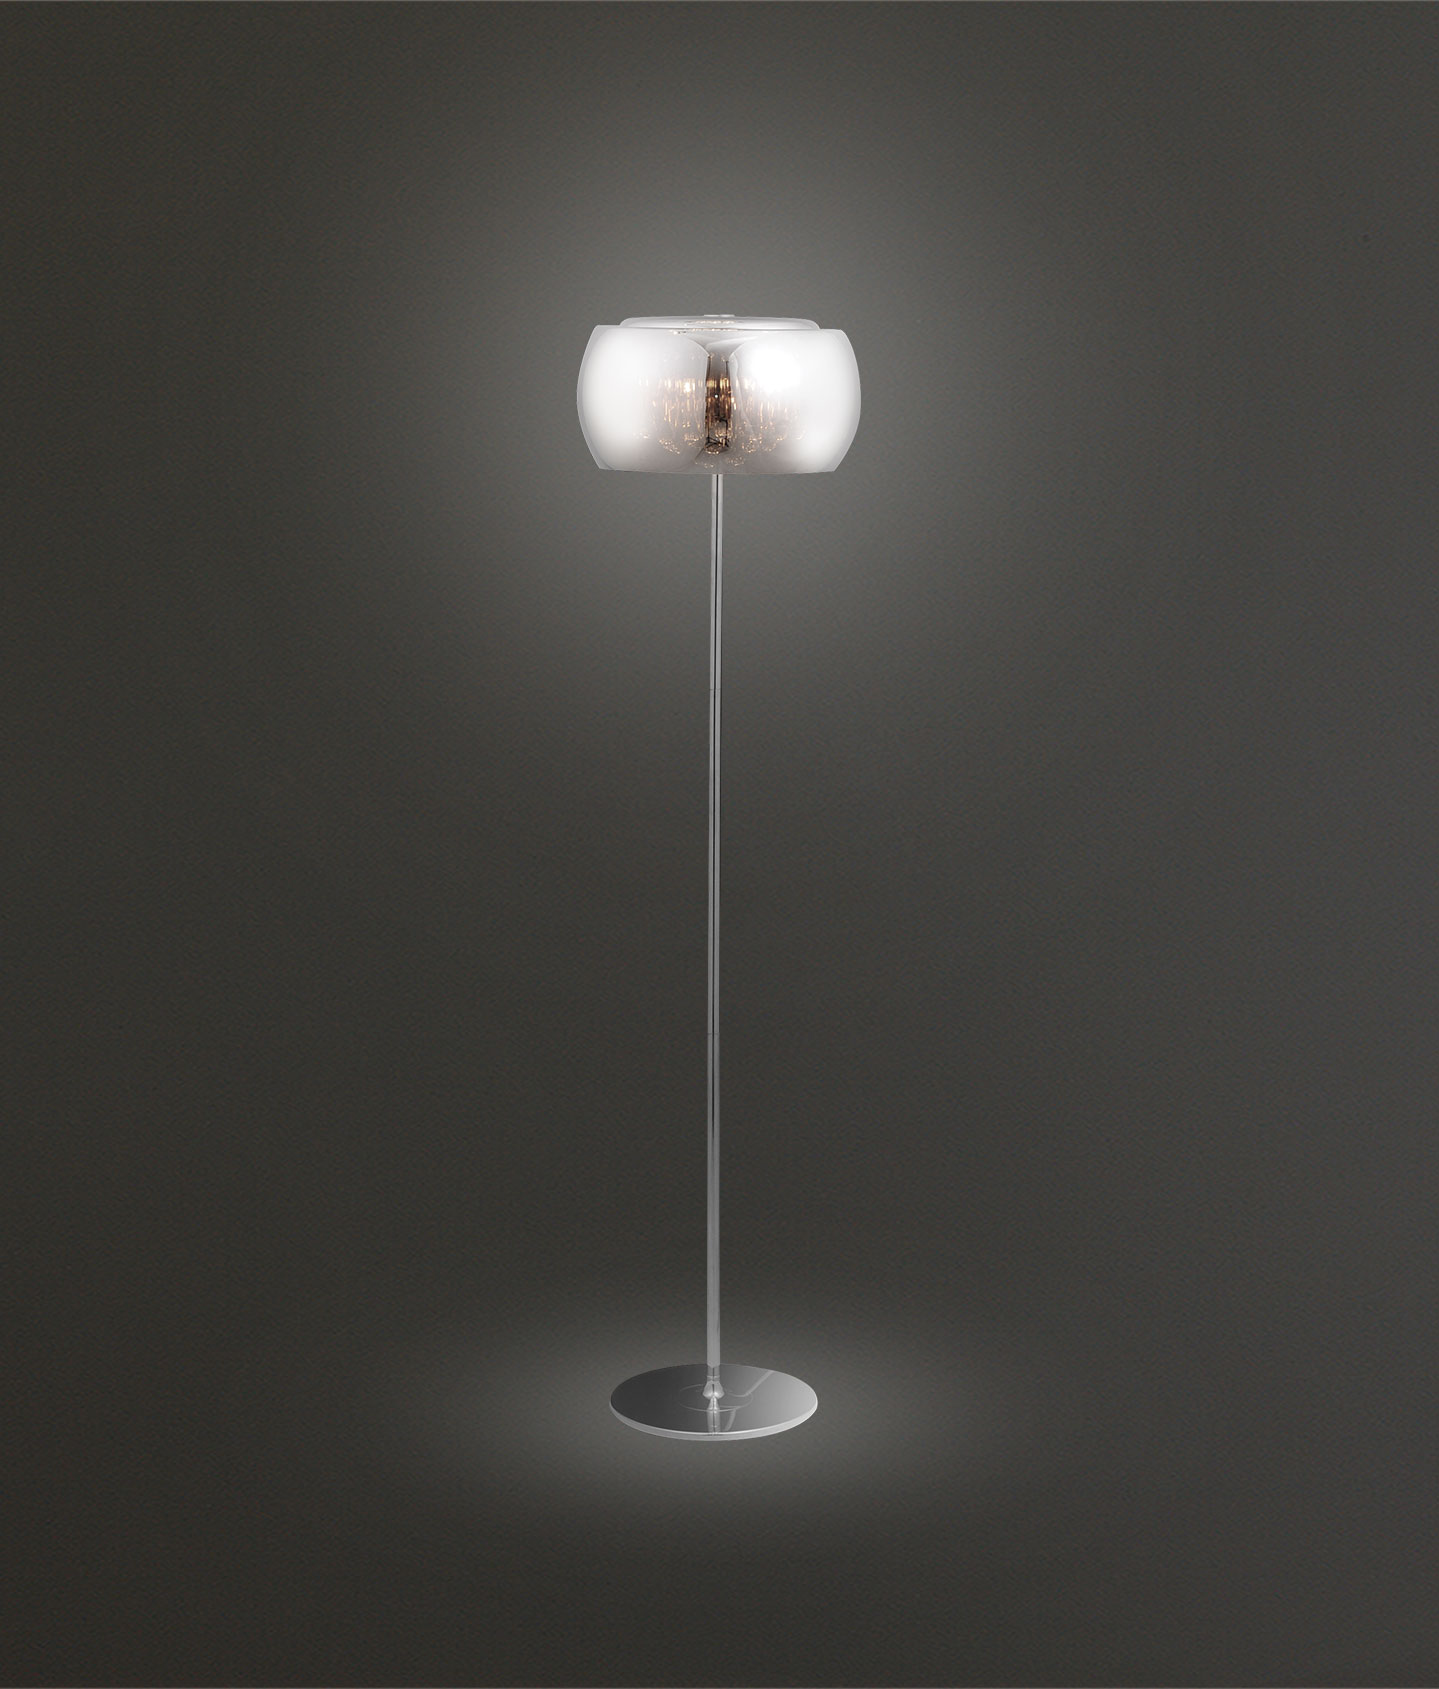 stehlampe moonlight lampen und leuchten online. Black Bedroom Furniture Sets. Home Design Ideas